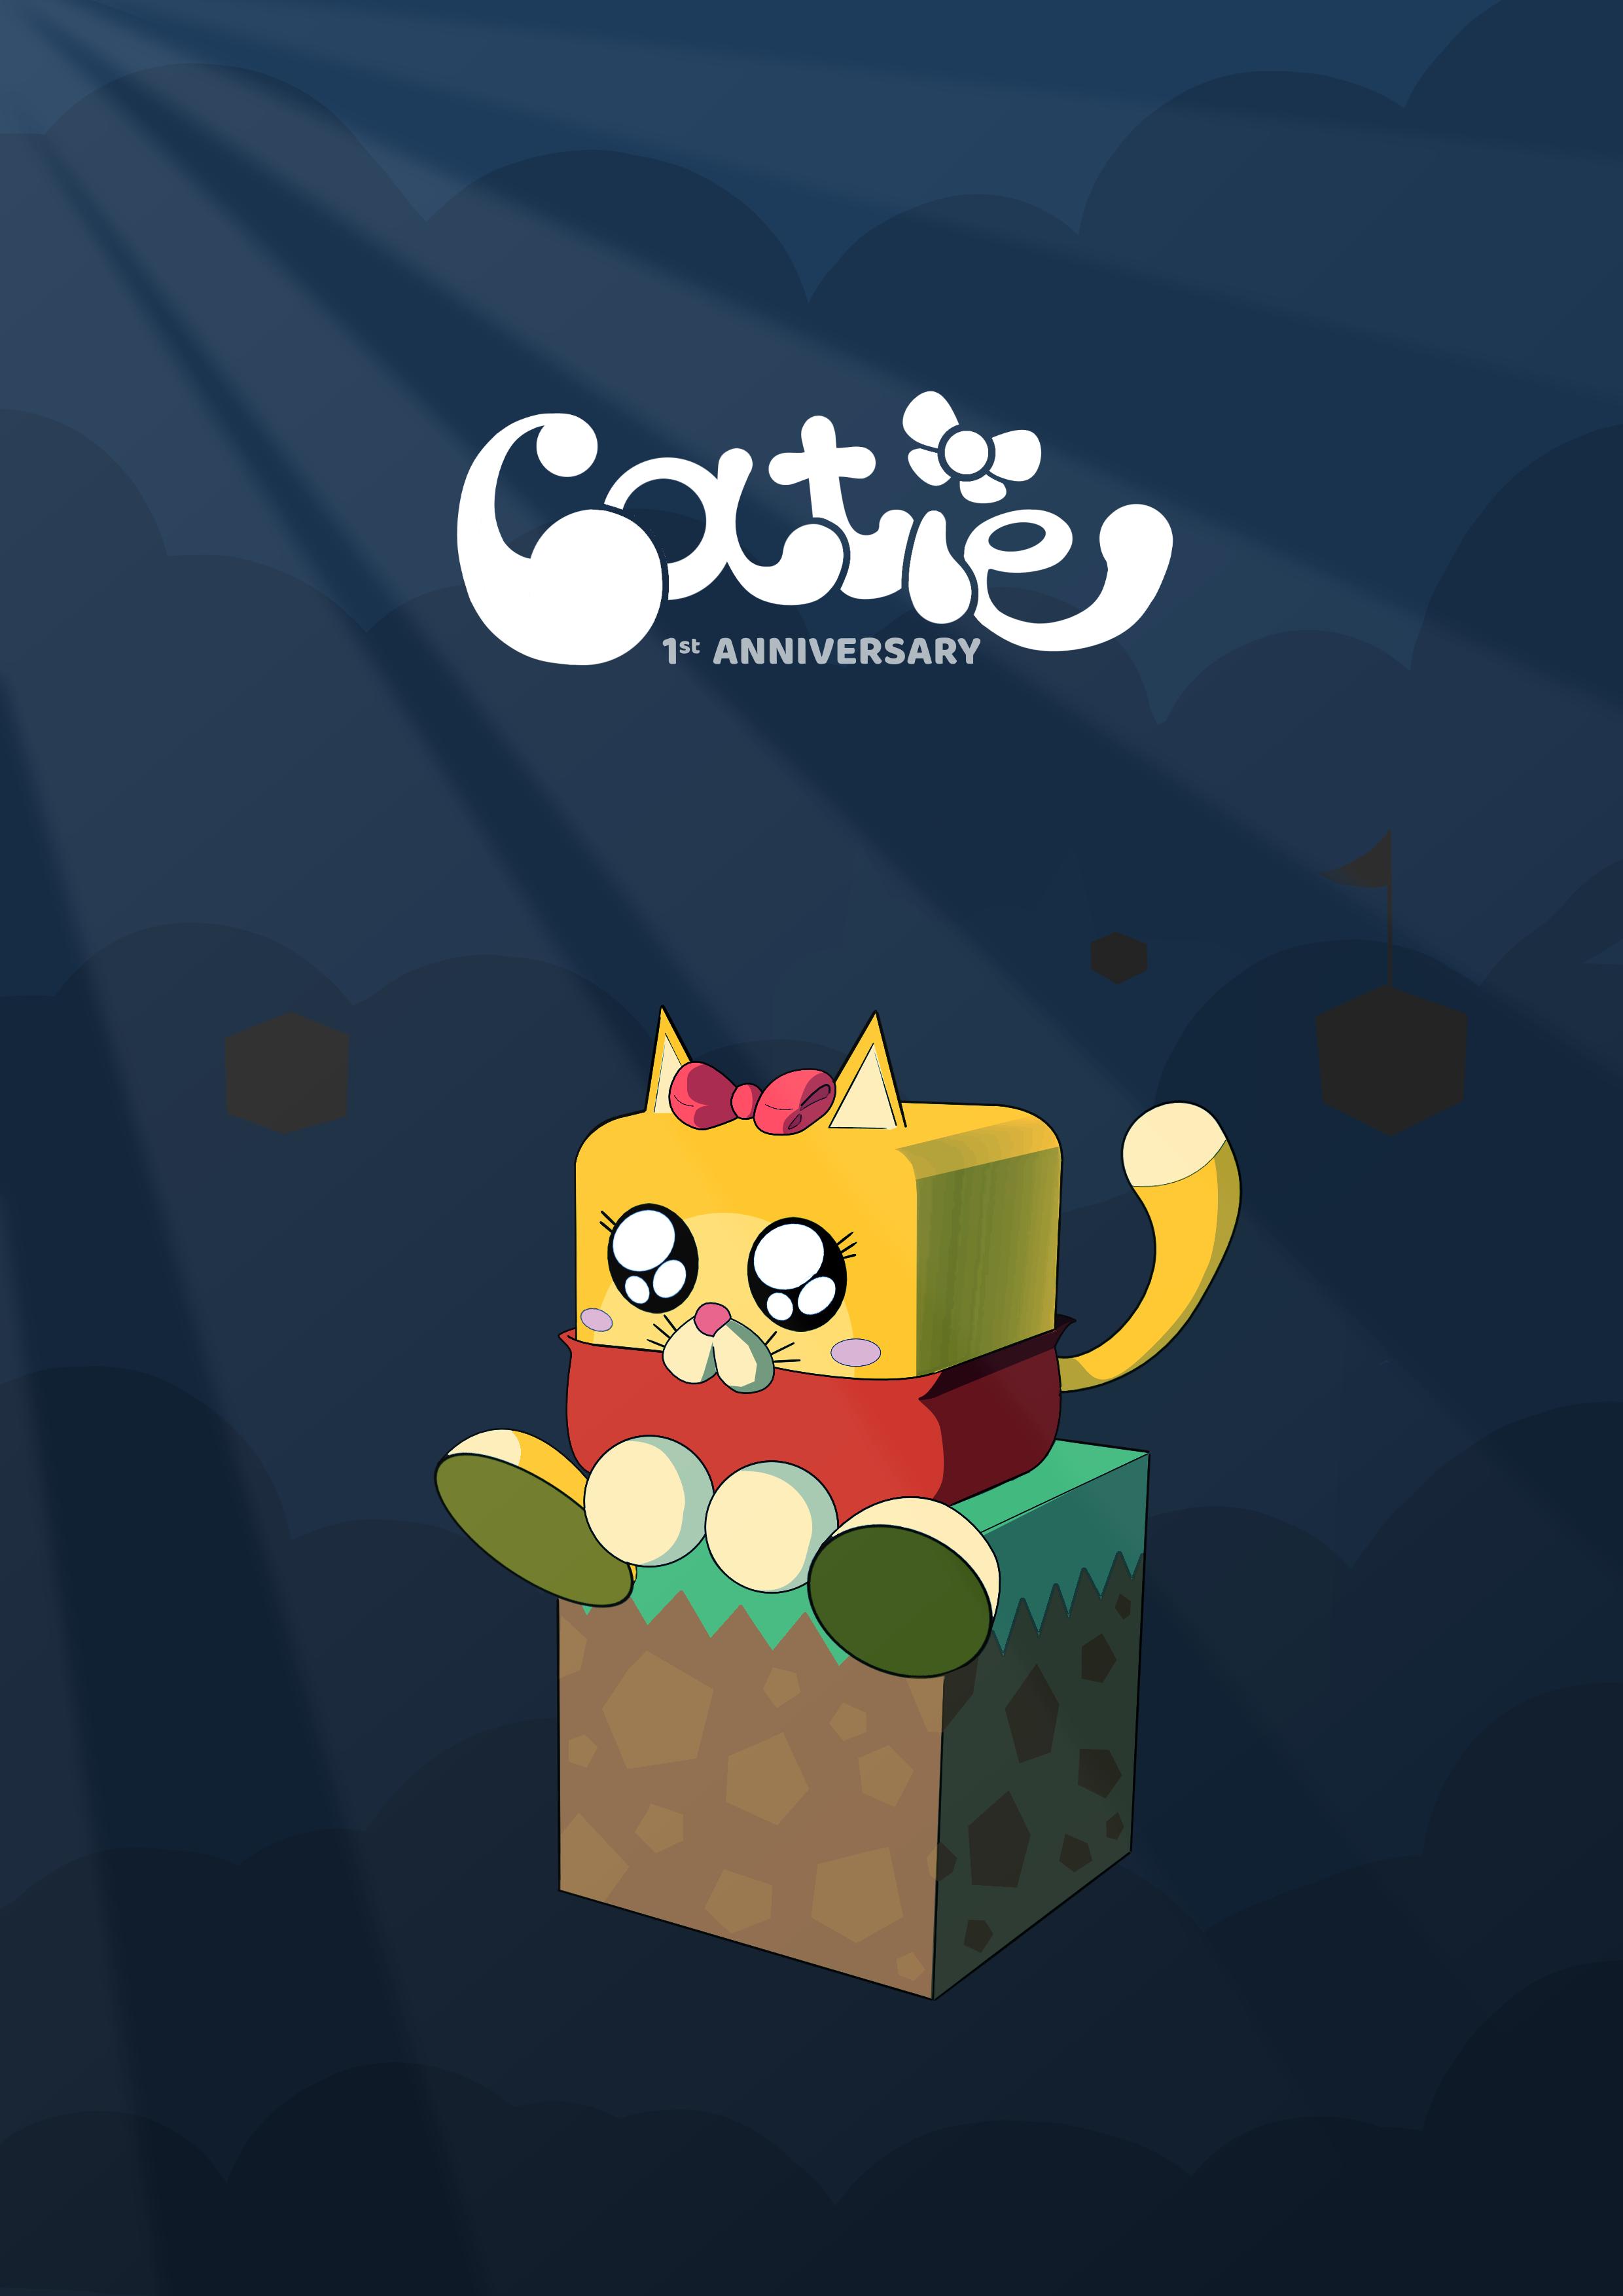 """Catie"" 1st Anniversary illustration"